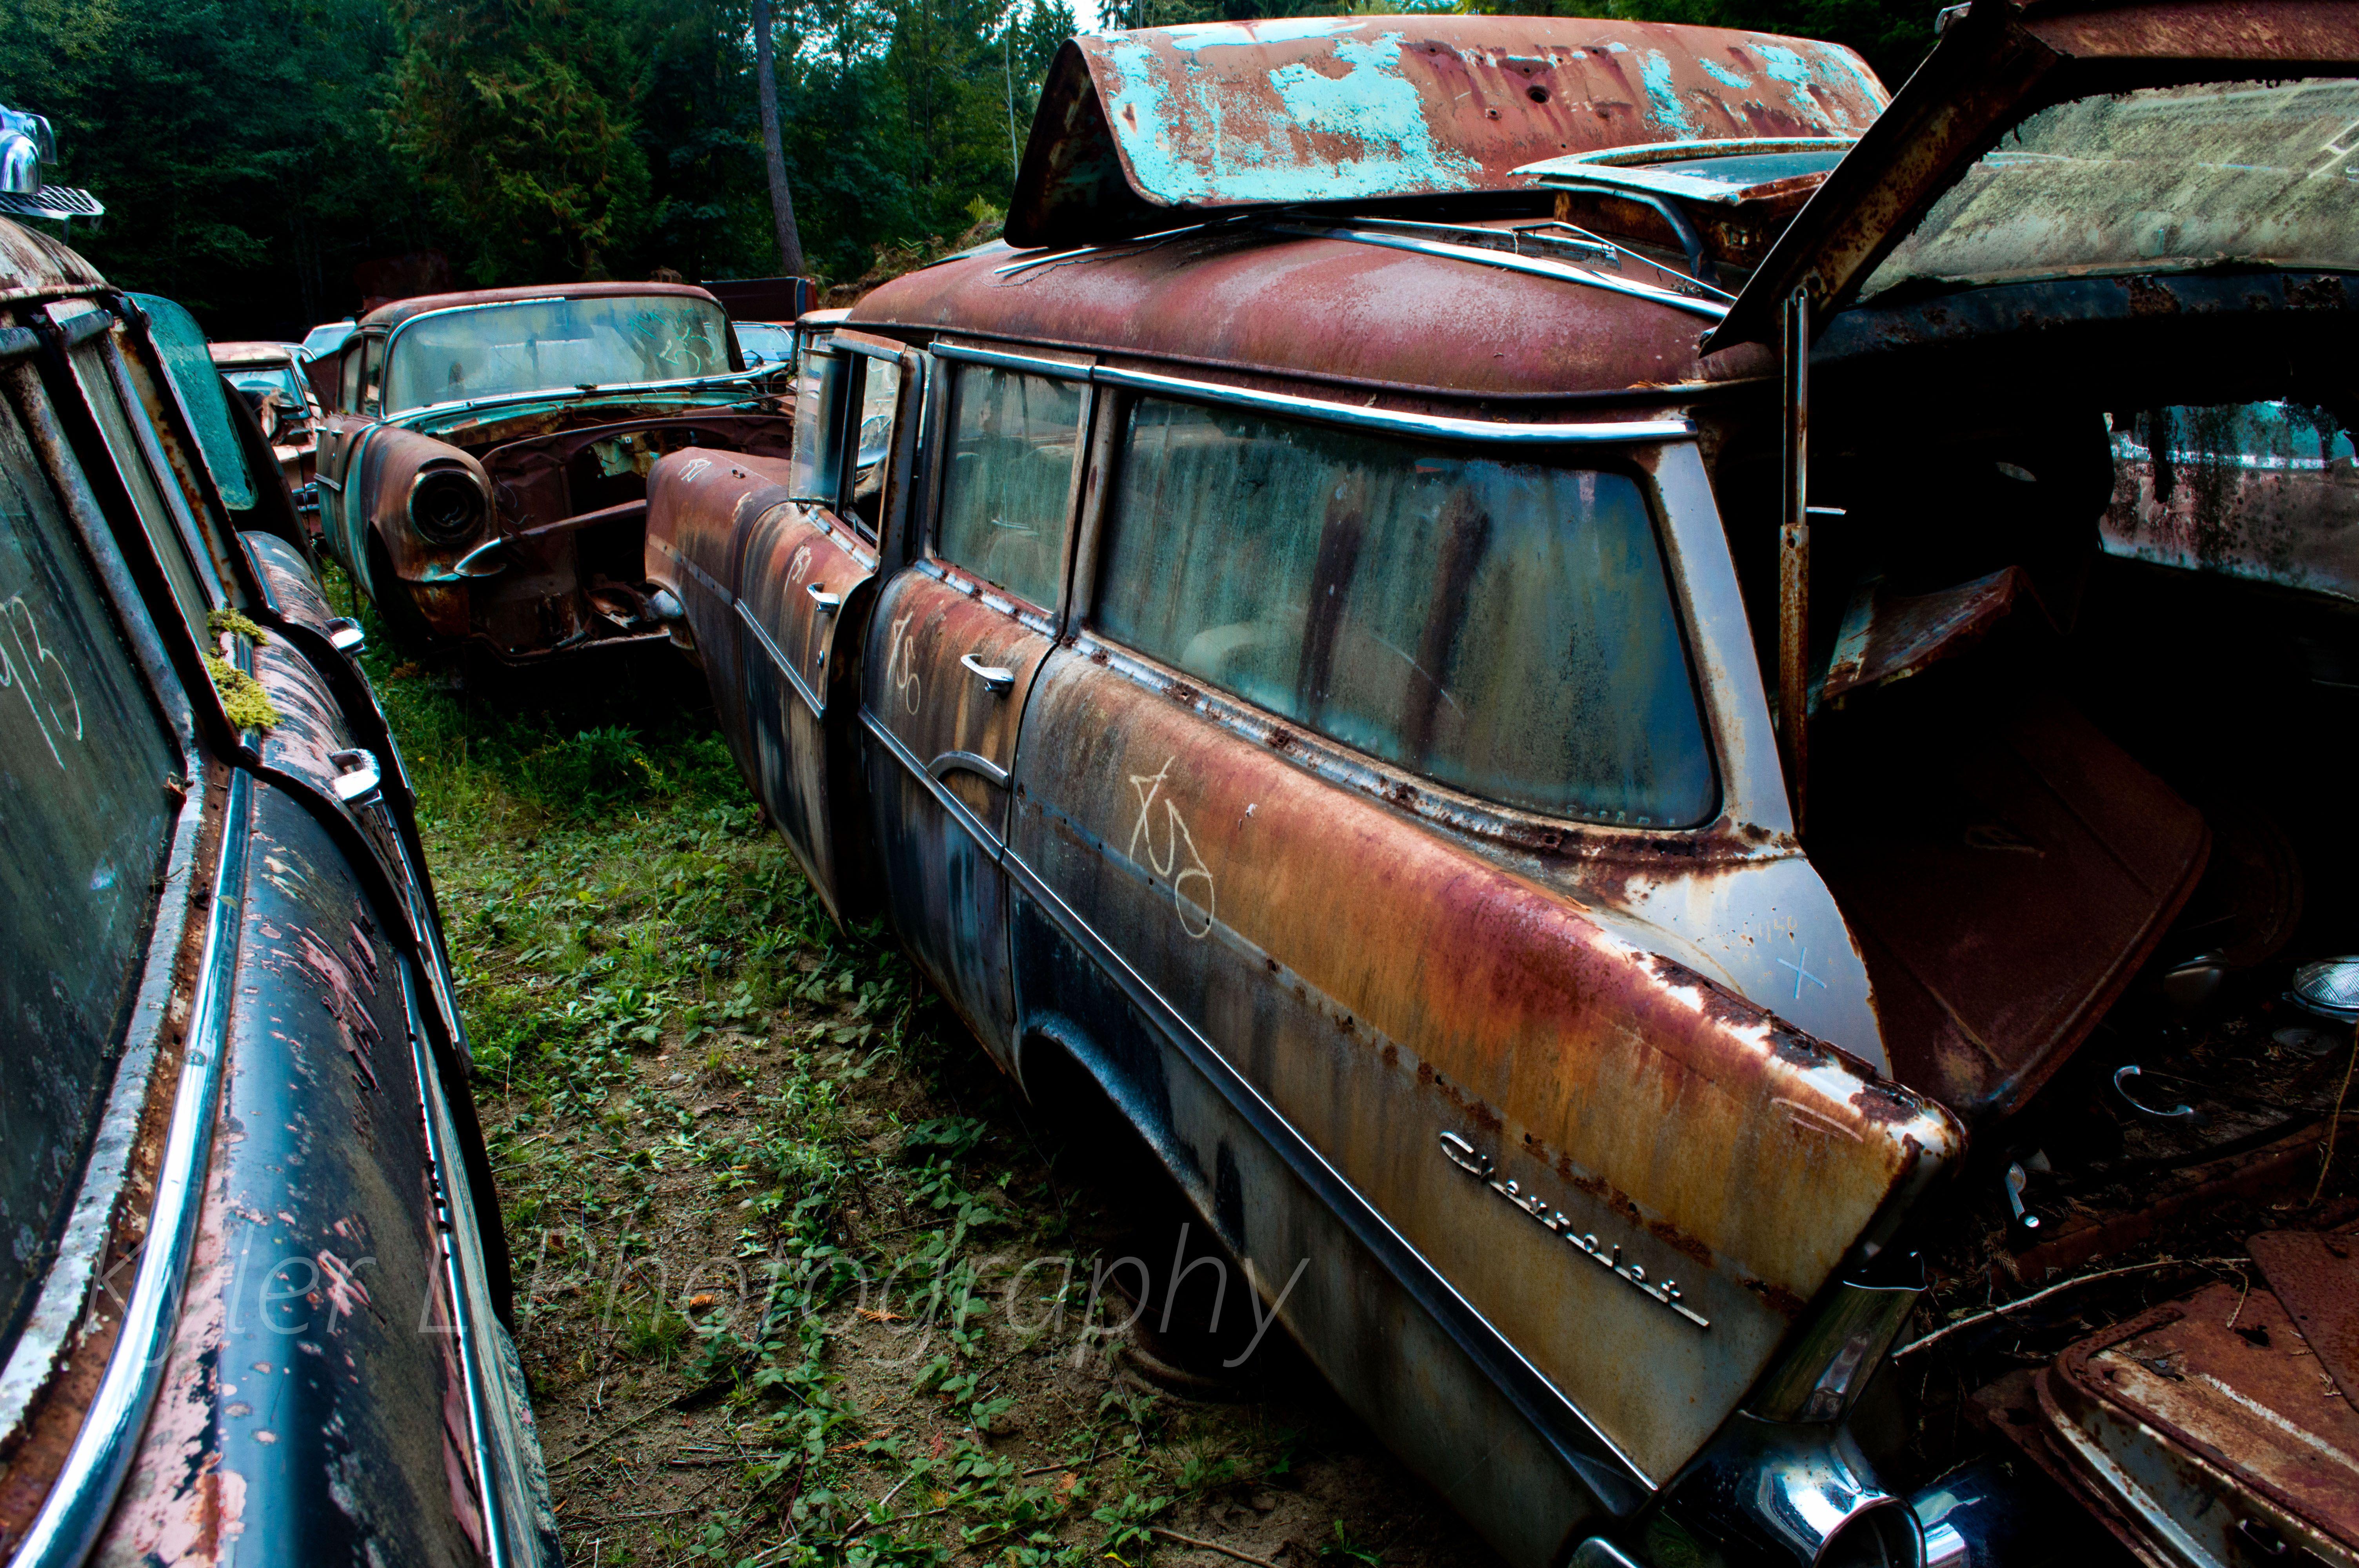 Old Cars At A Wrecking Yard In Northwest Washington Kyler L